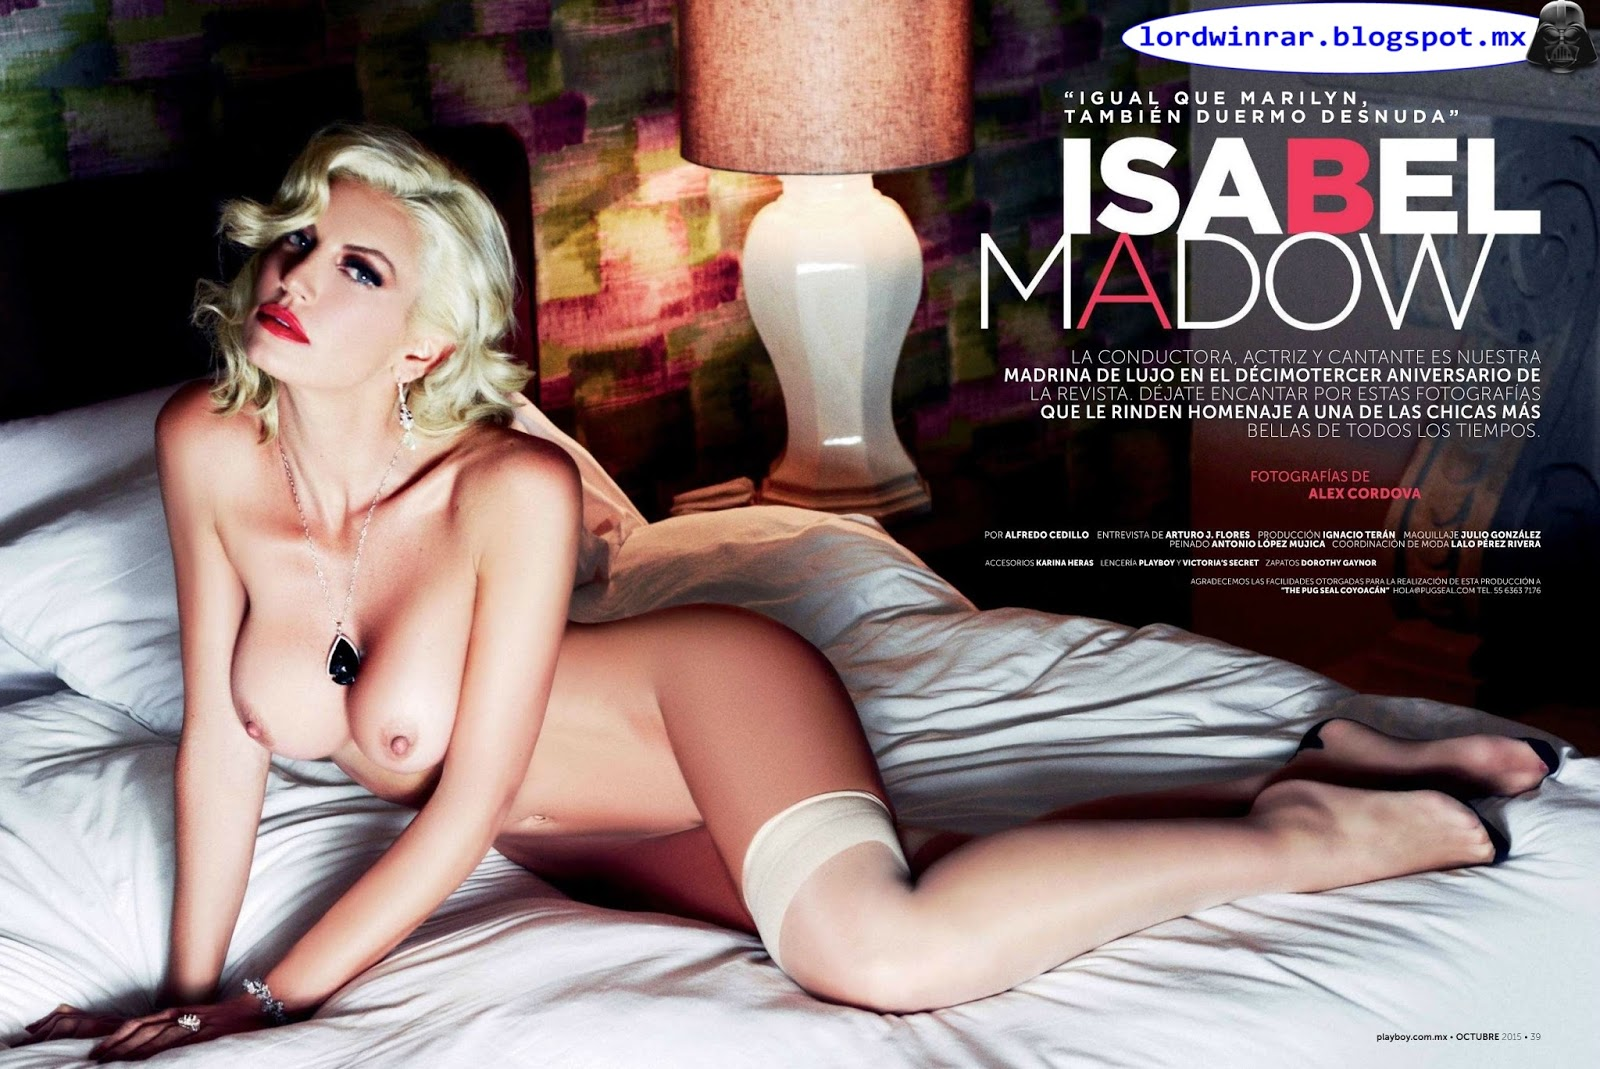 isabel madow video porno anal xxx